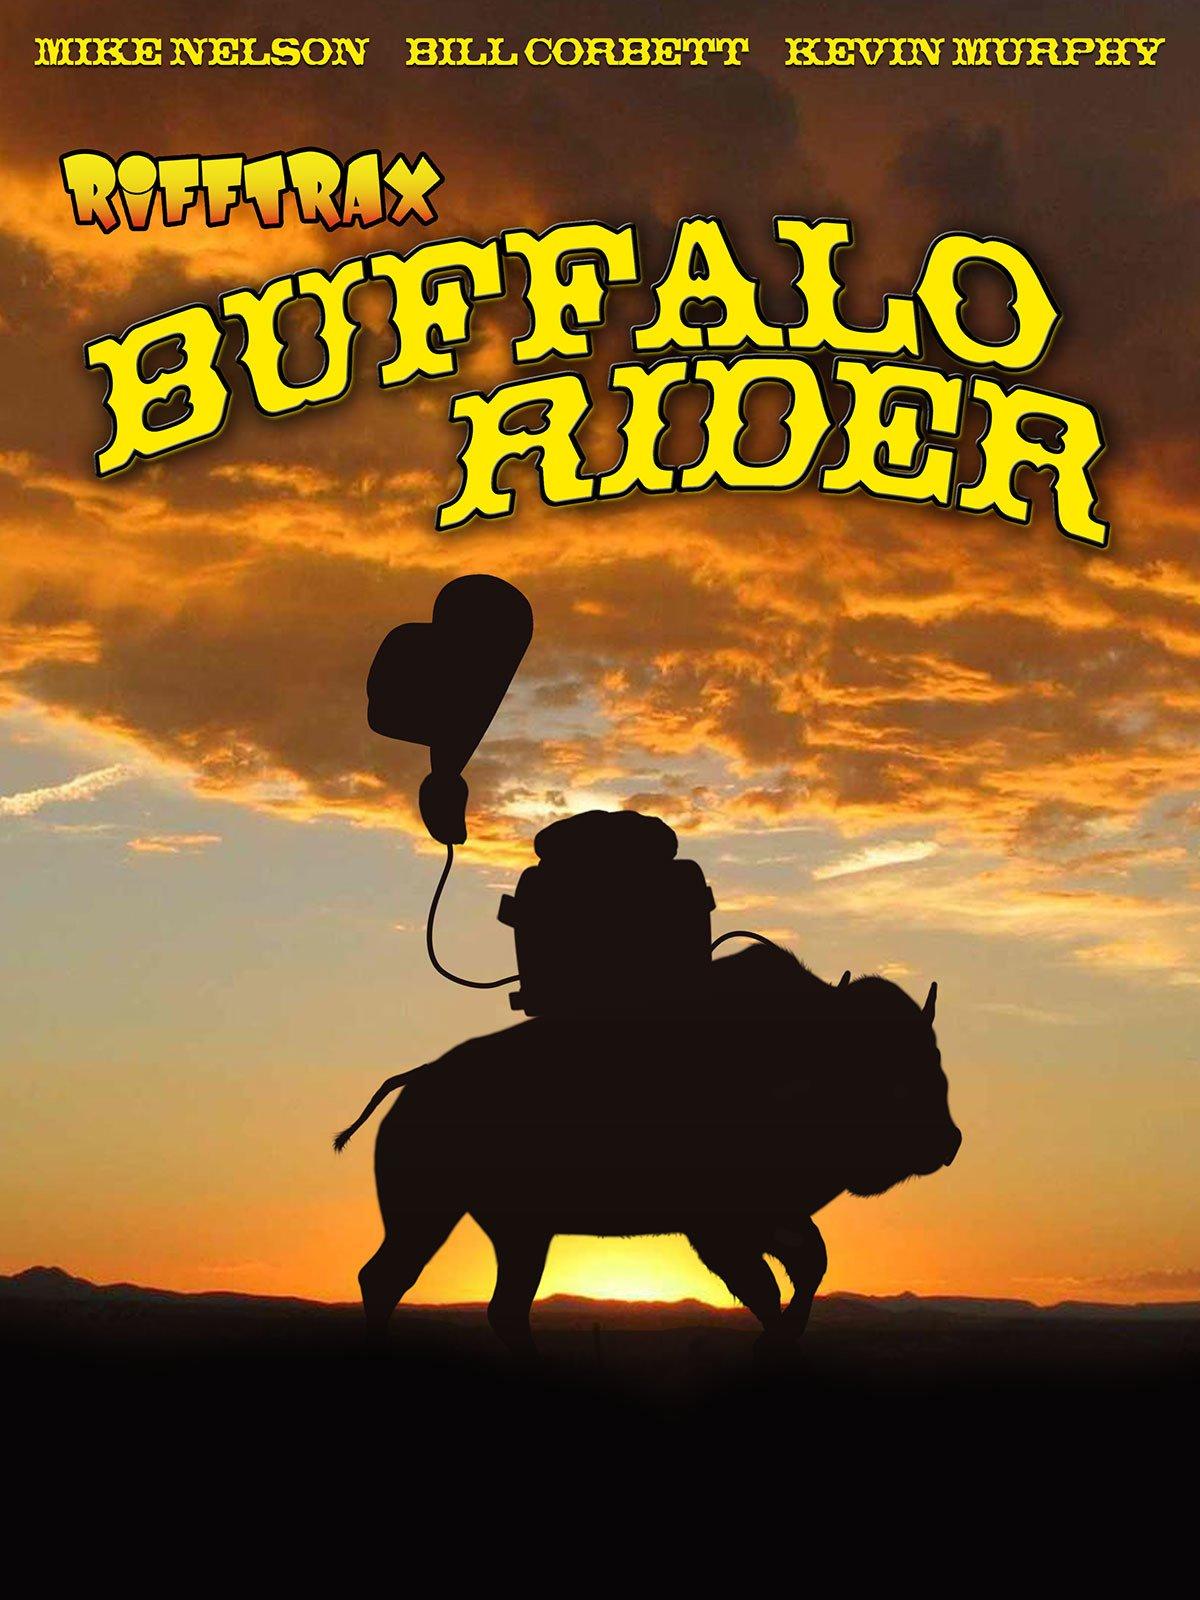 RiffTrax: Buffalo Rider